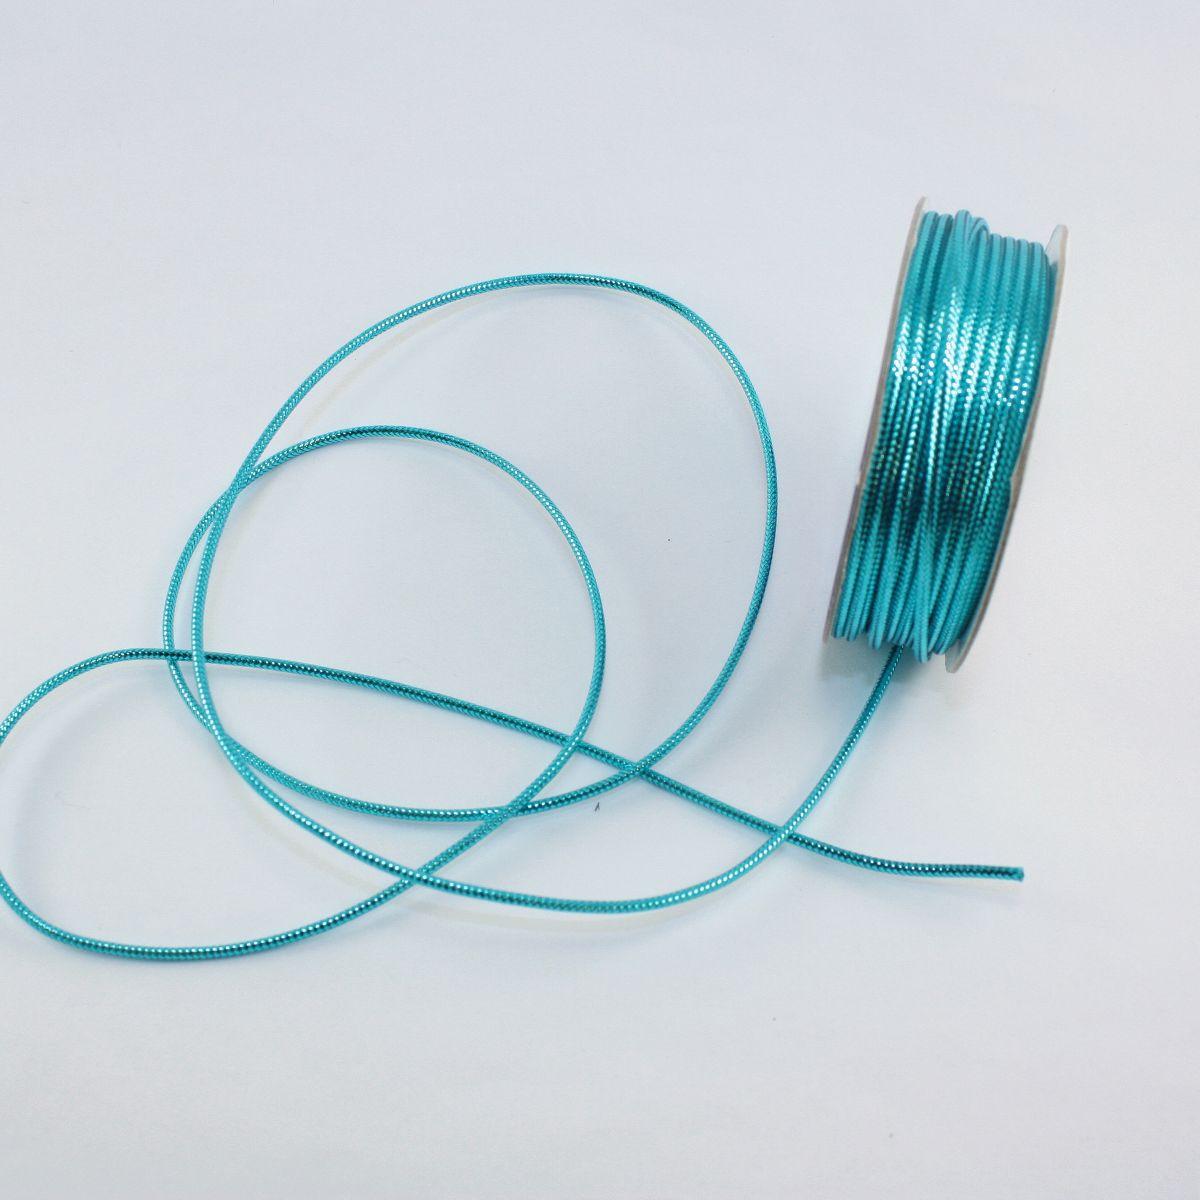 Cordelette en bobine bleu 1.6 mm